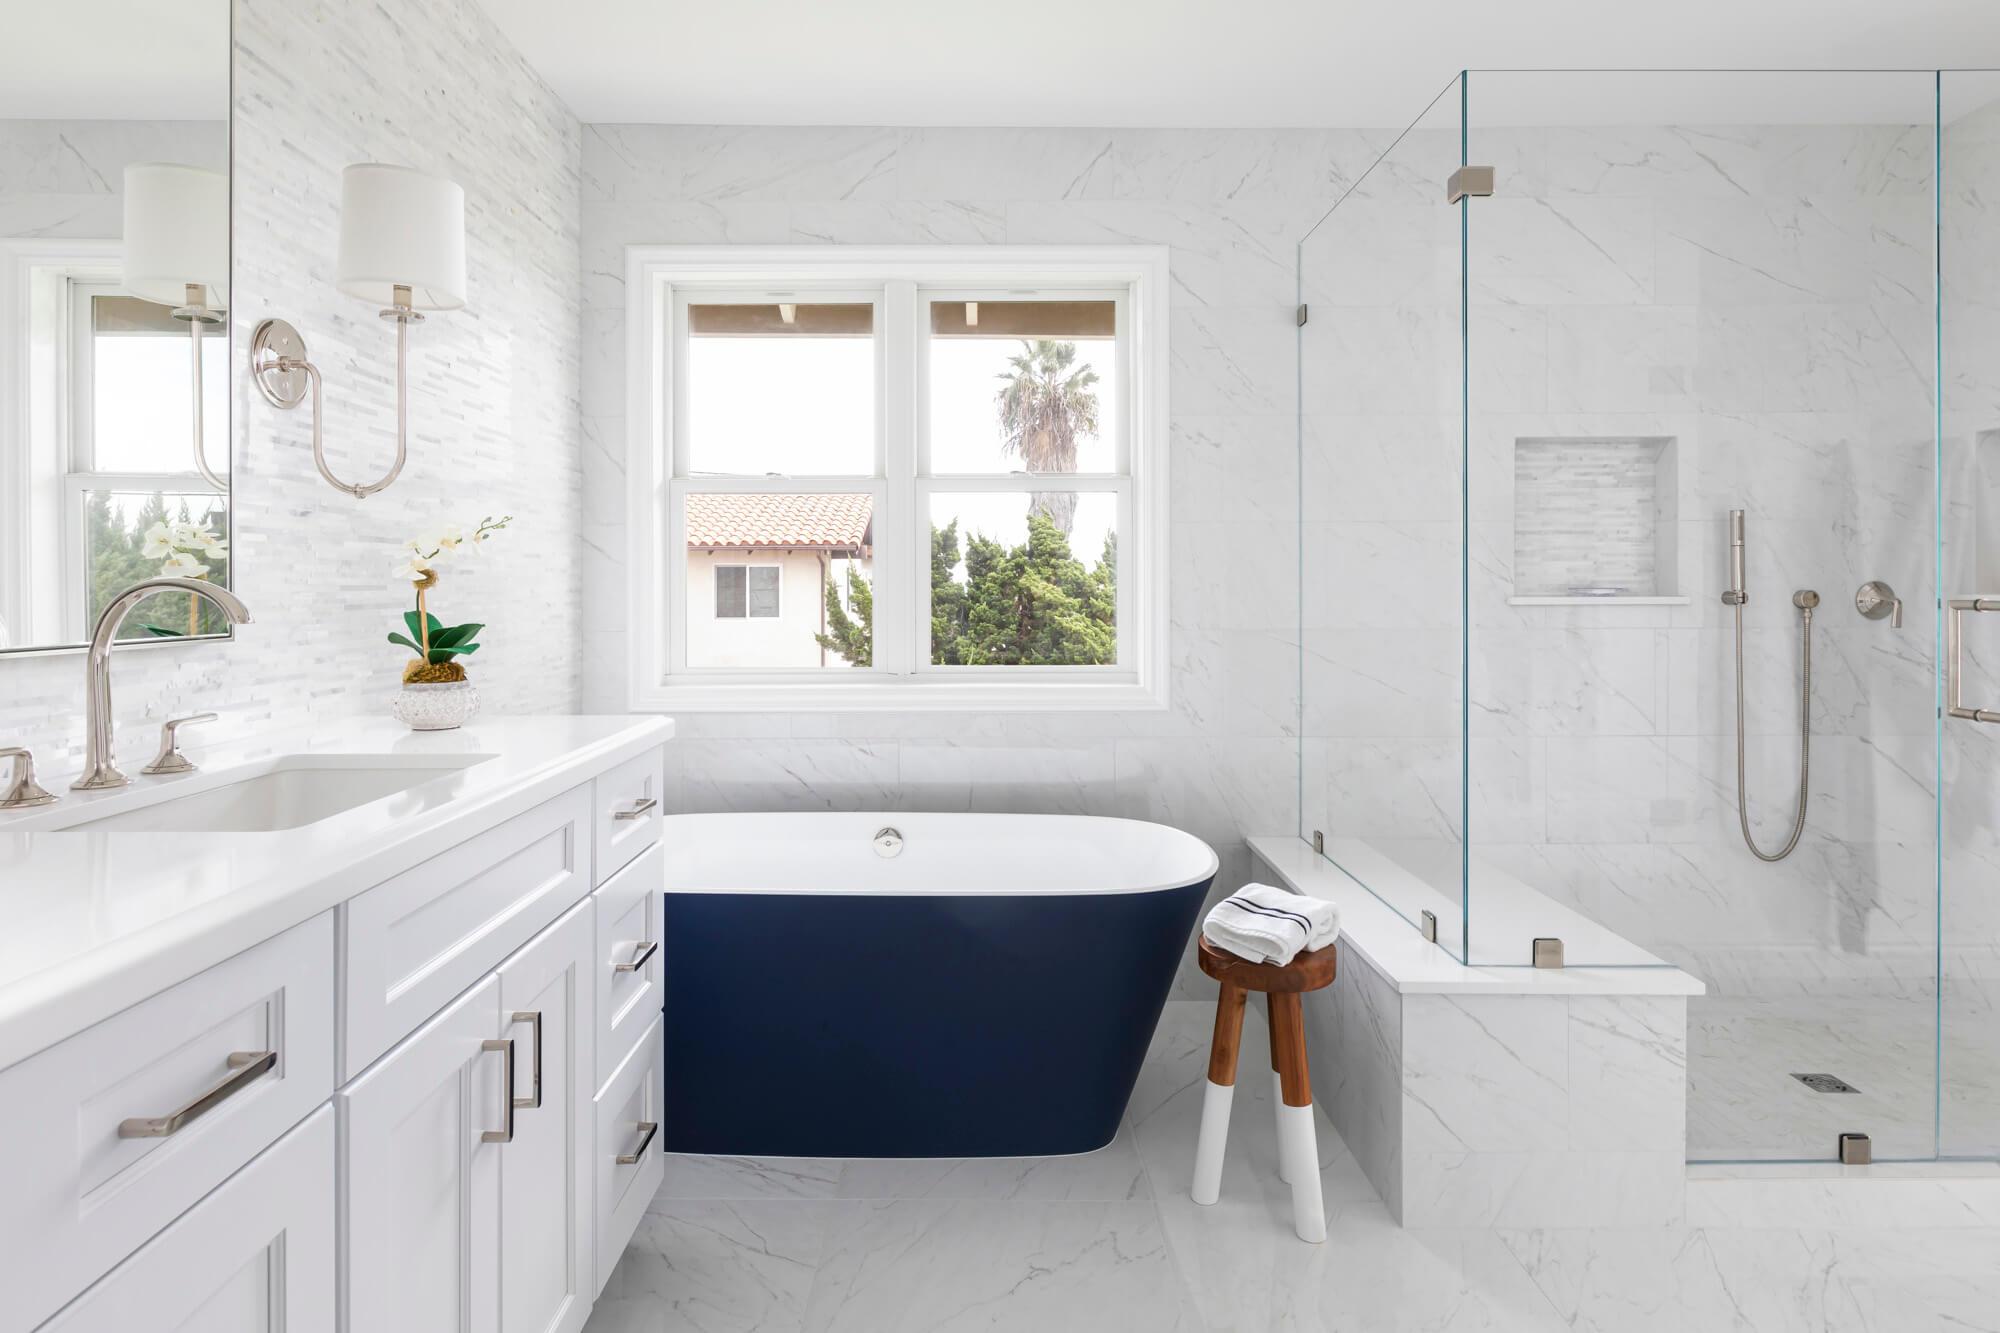 White bathroom with blue tub